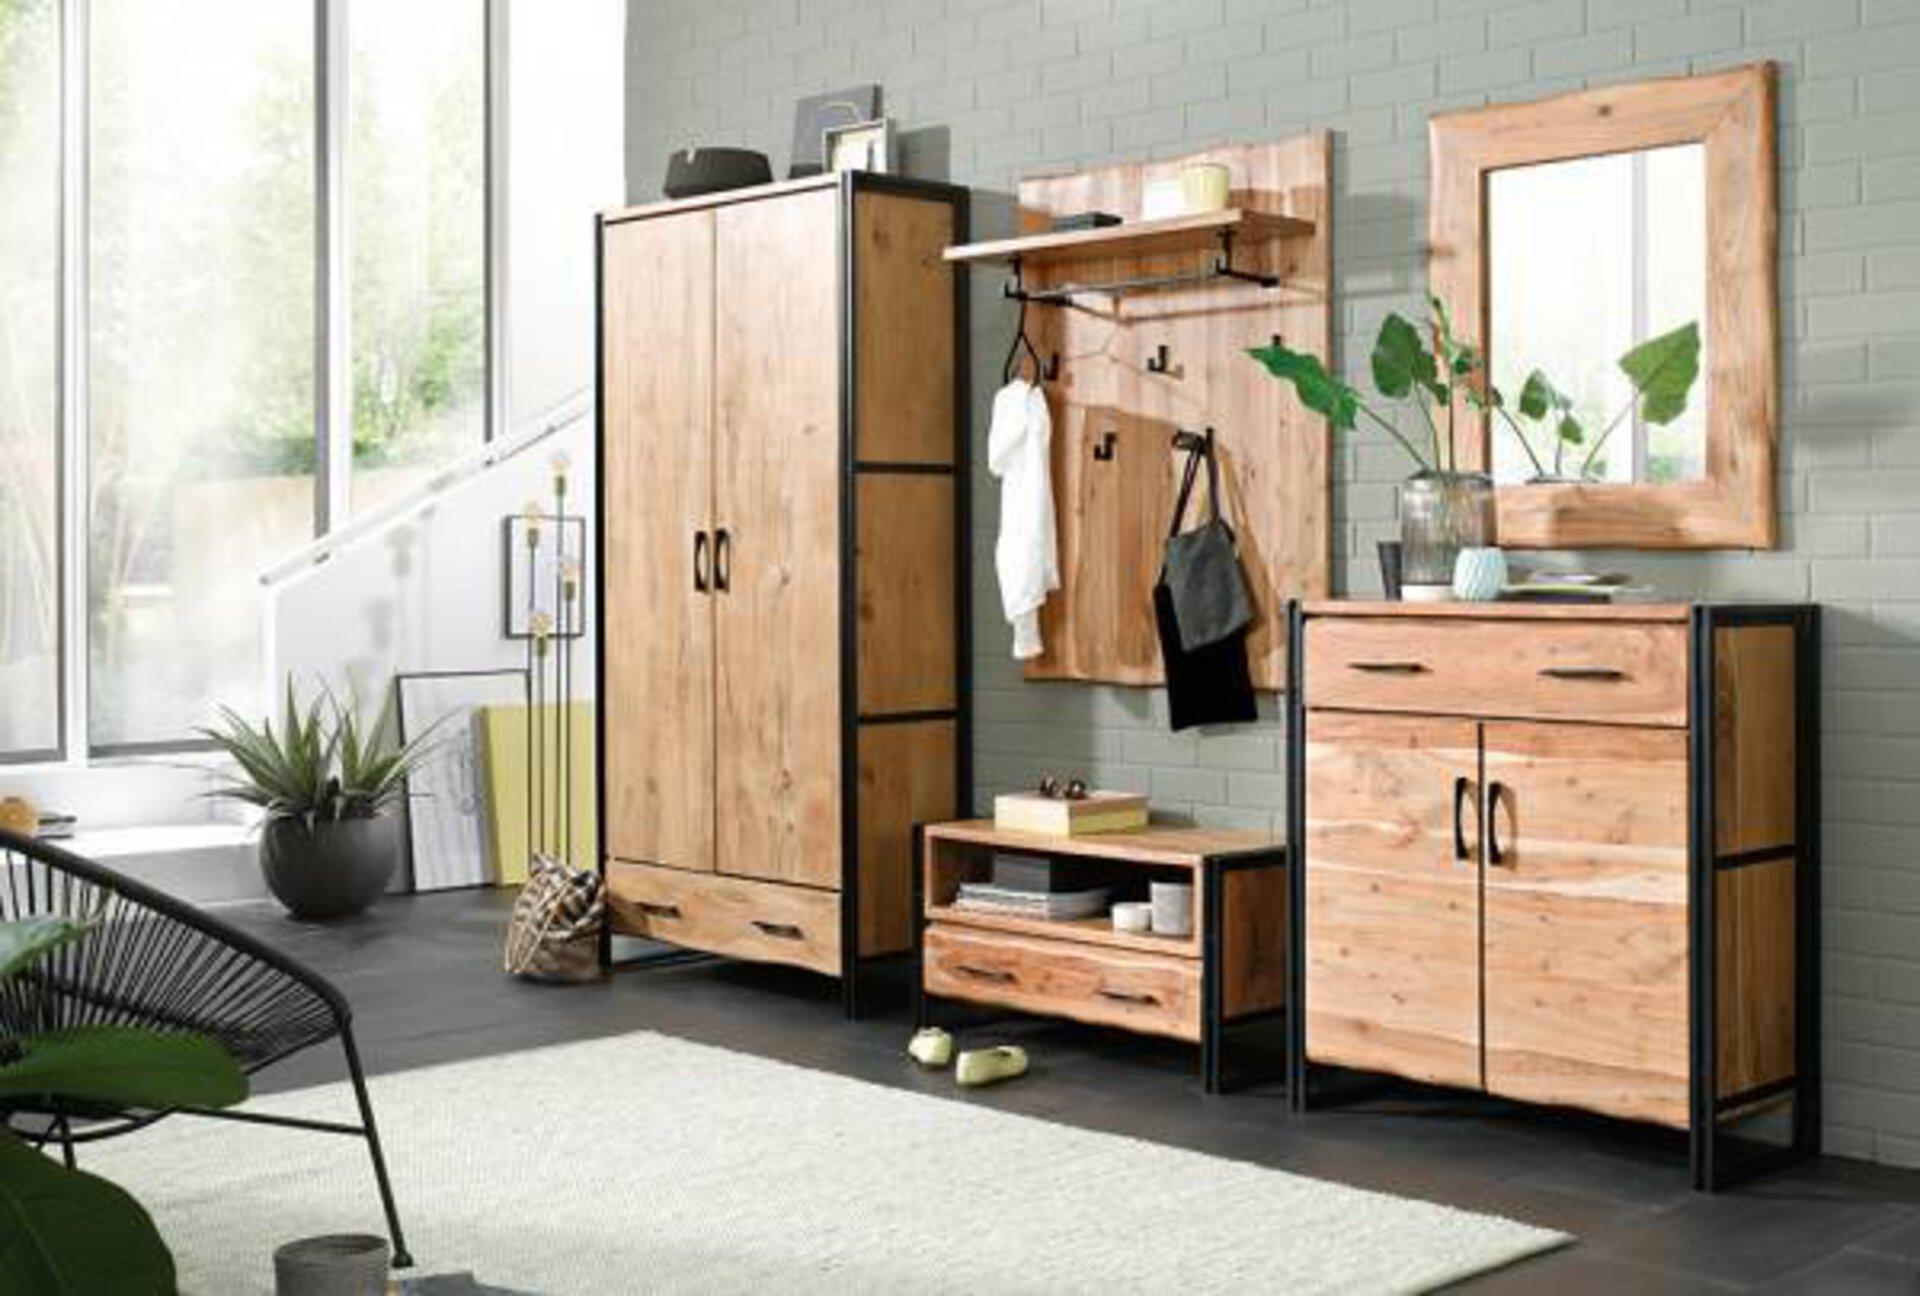 Garderobenbank Edge Vito Holzwerkstoff mehrfarbig 40 x 48 x 90 cm